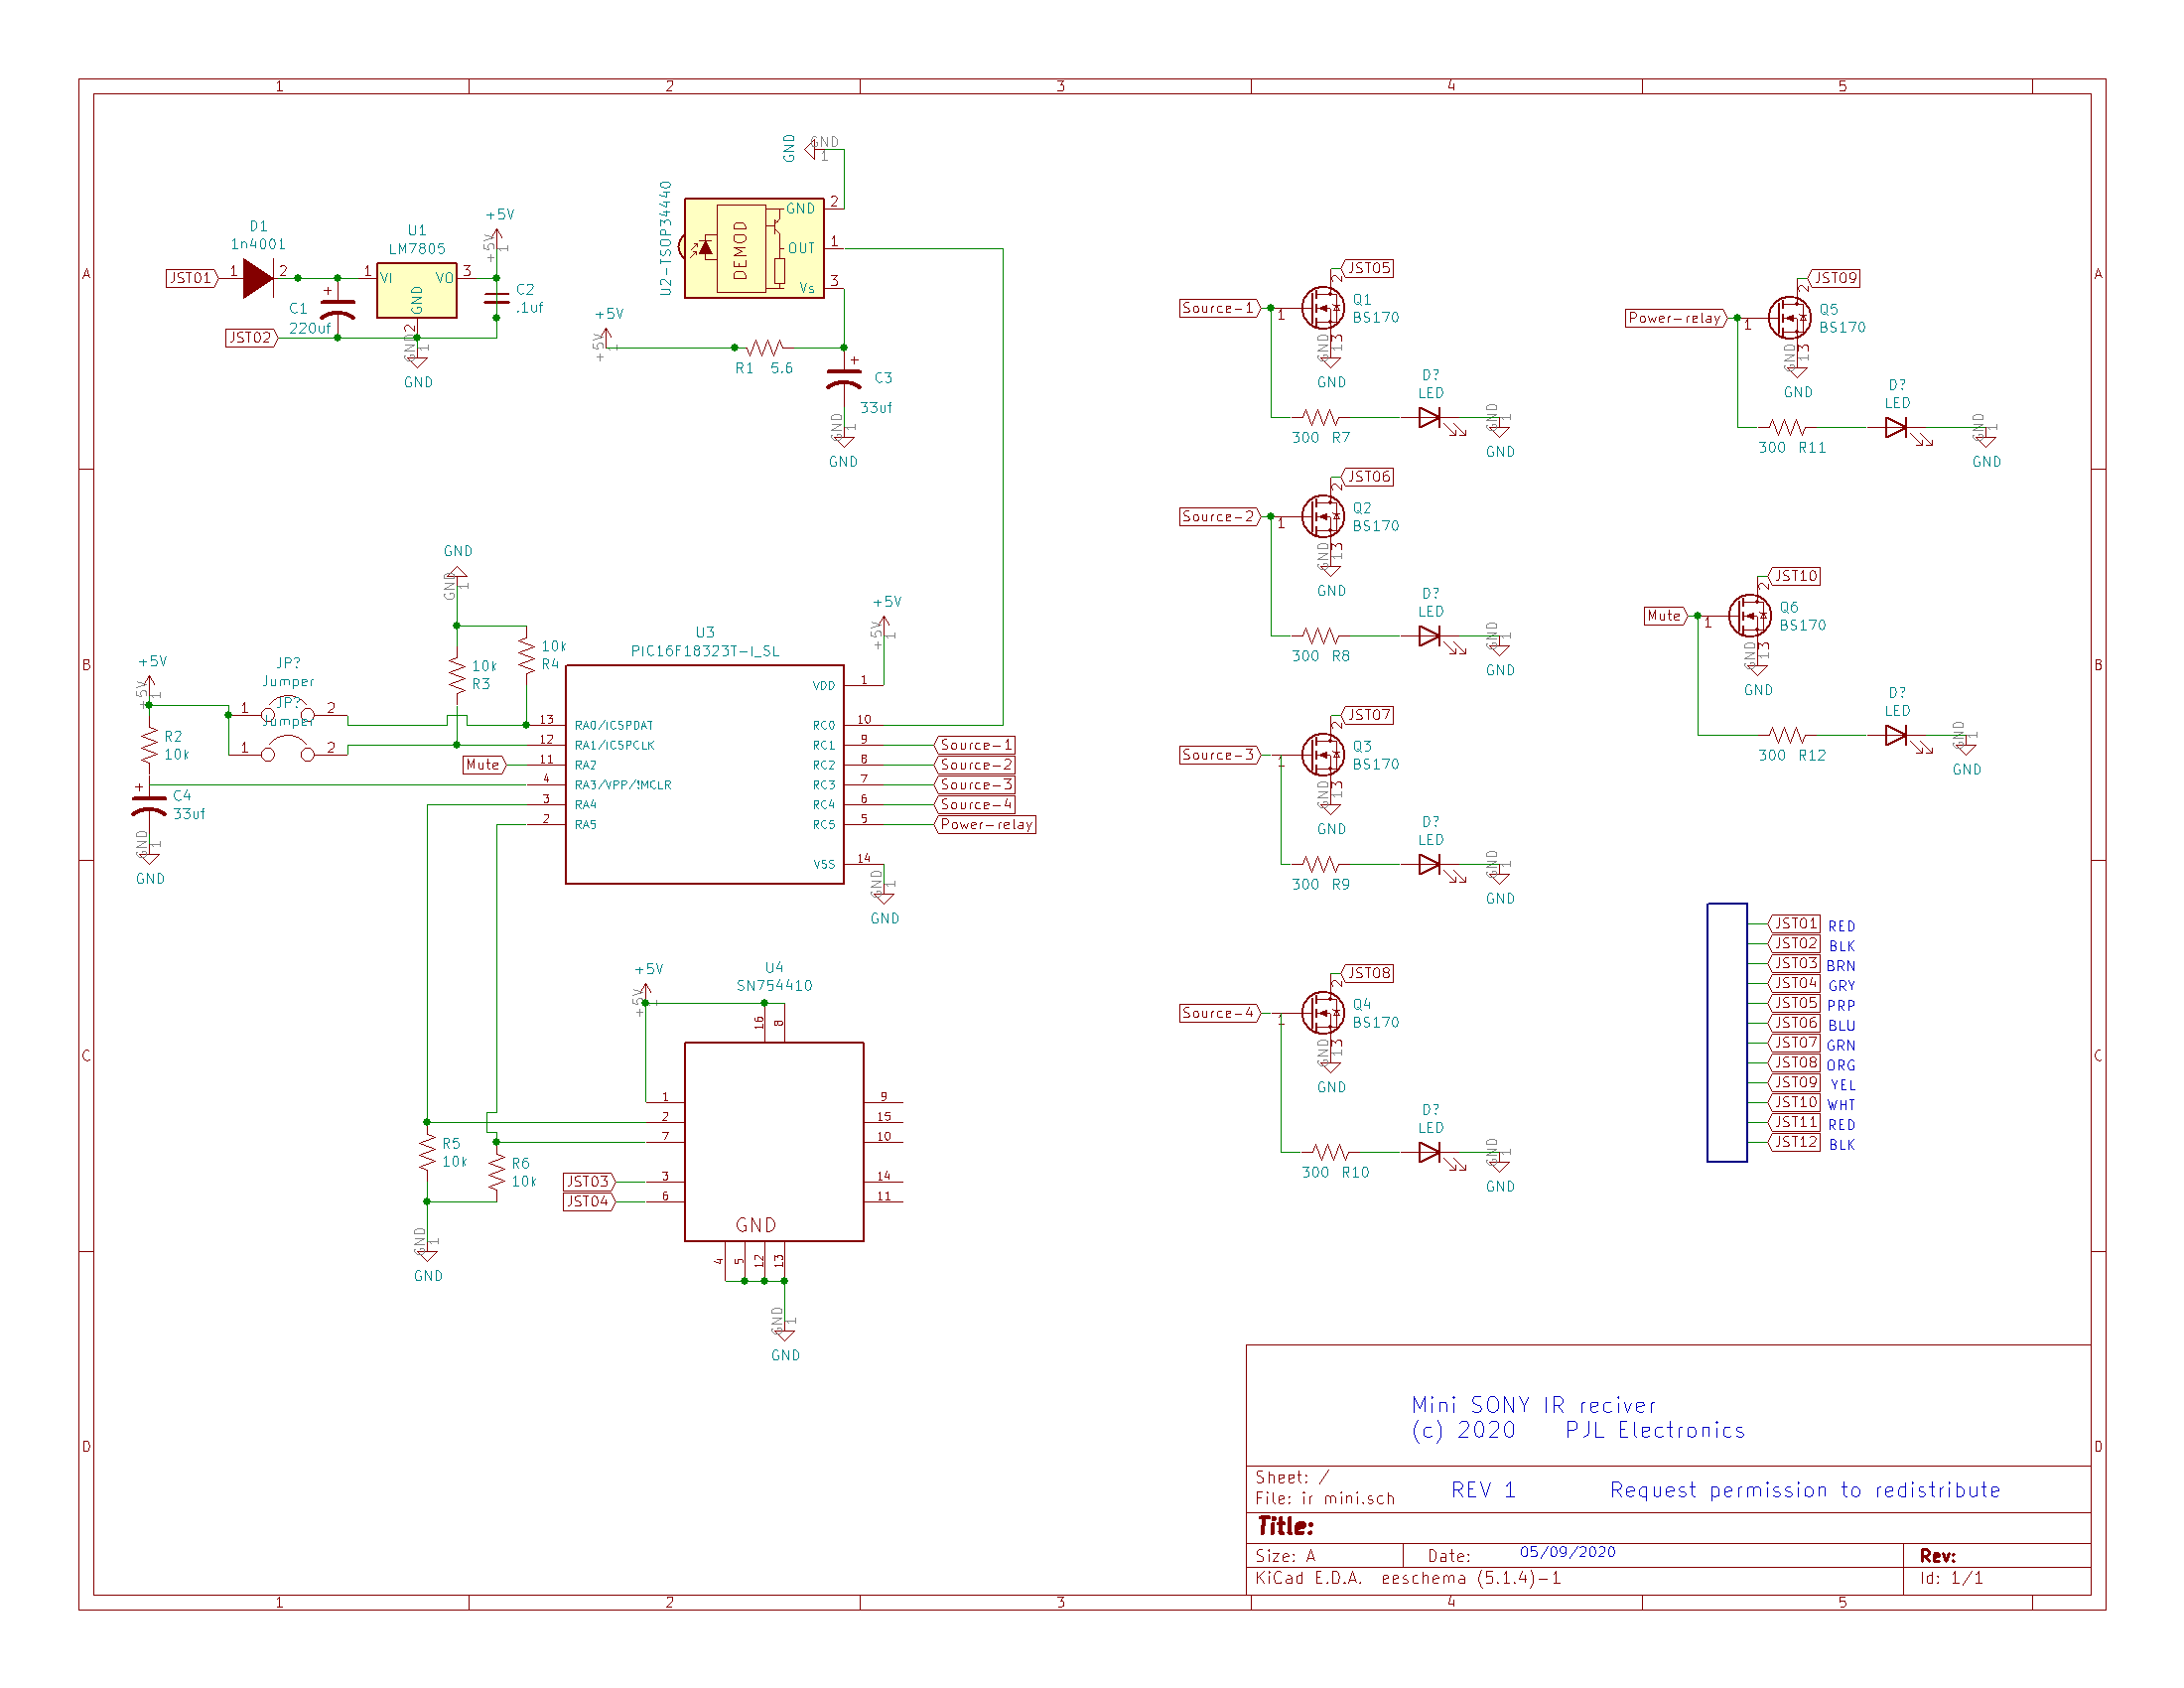 Simple SONY IR schematic